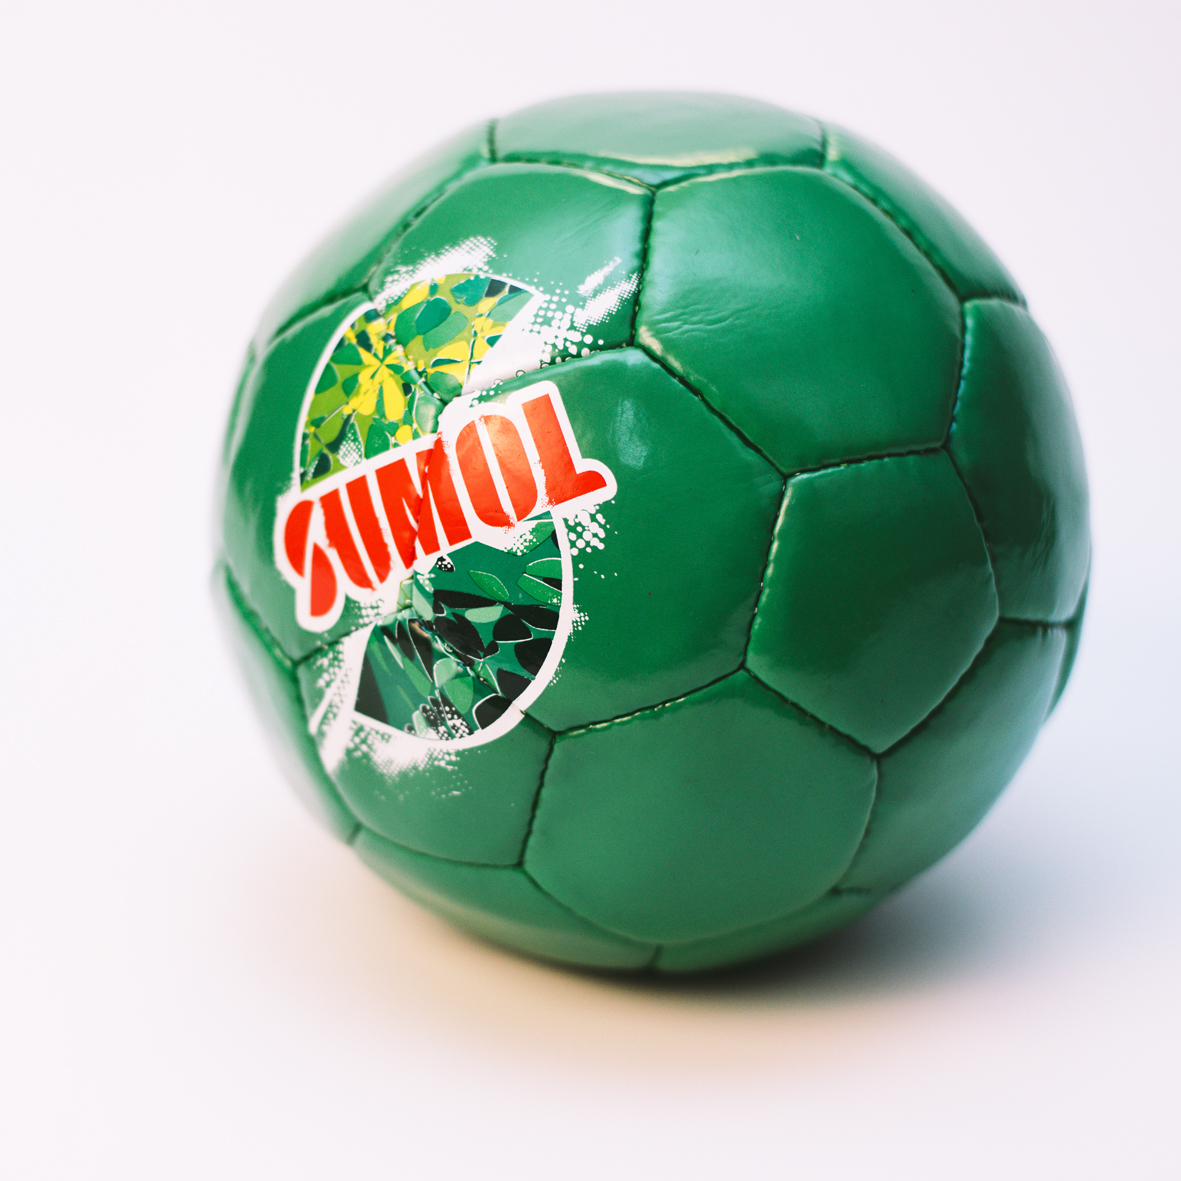 Bola-Futebol-Impressao-Total-Sumol